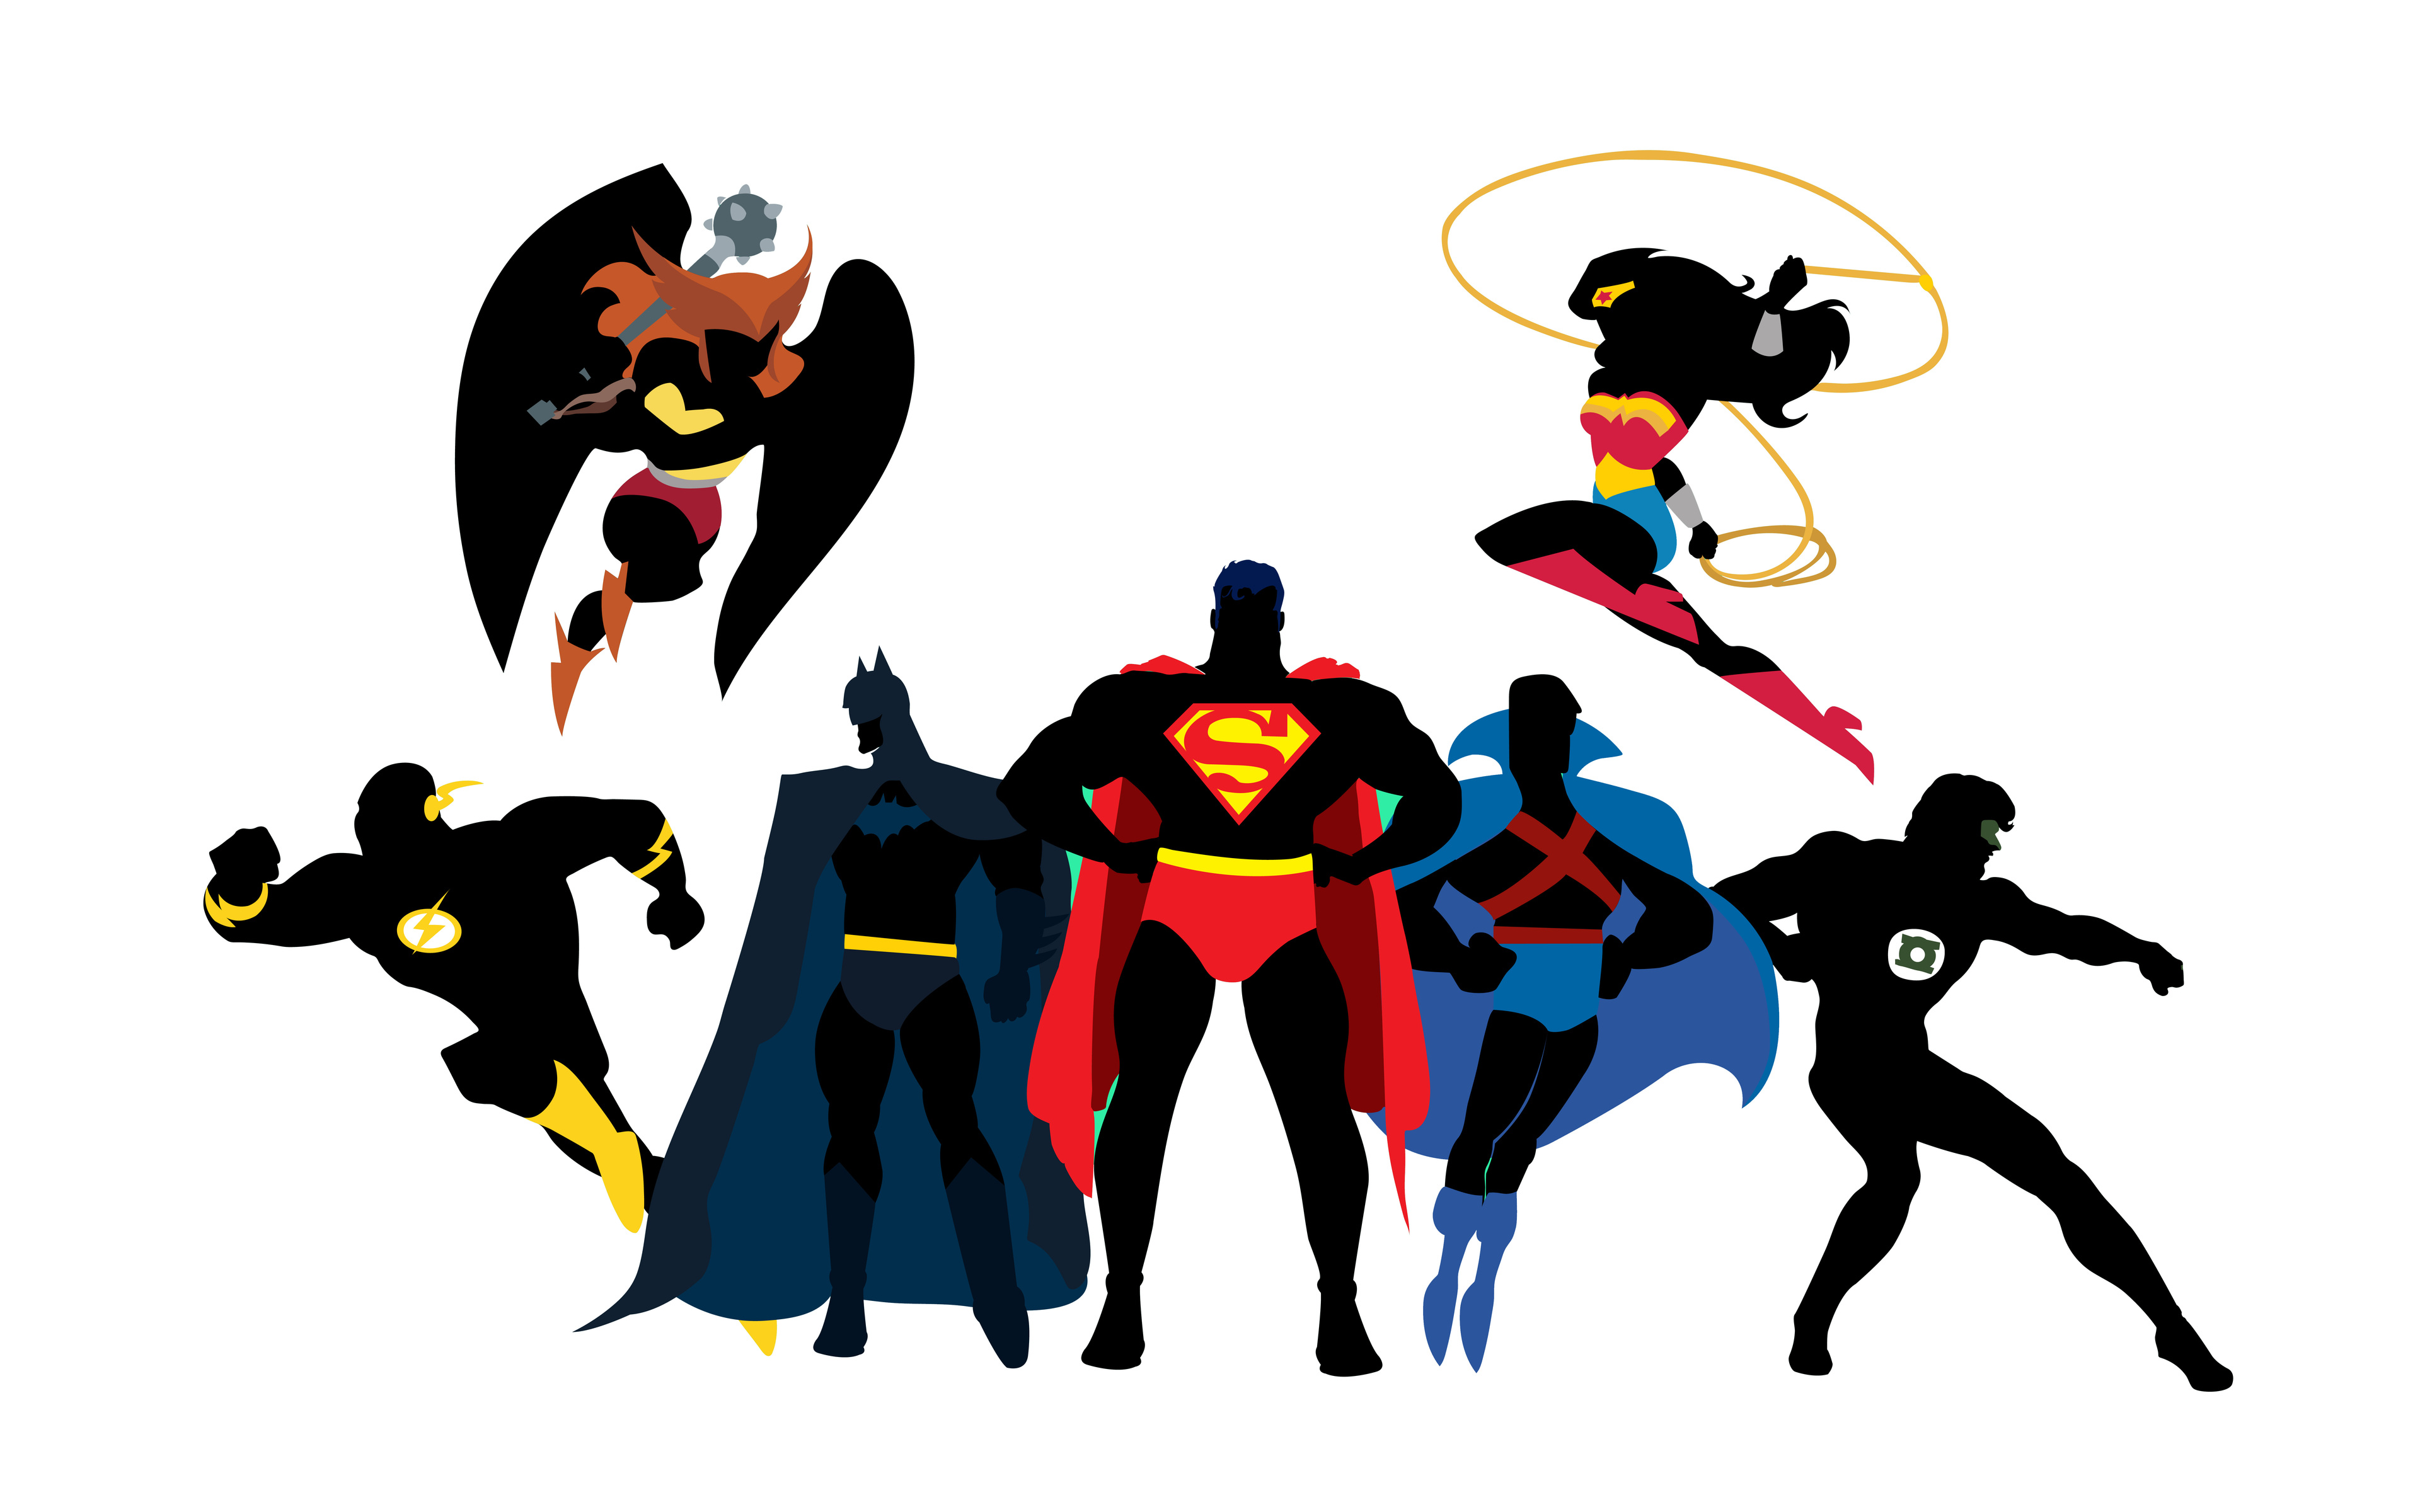 dc-superheroes-artwork-9v.jpg